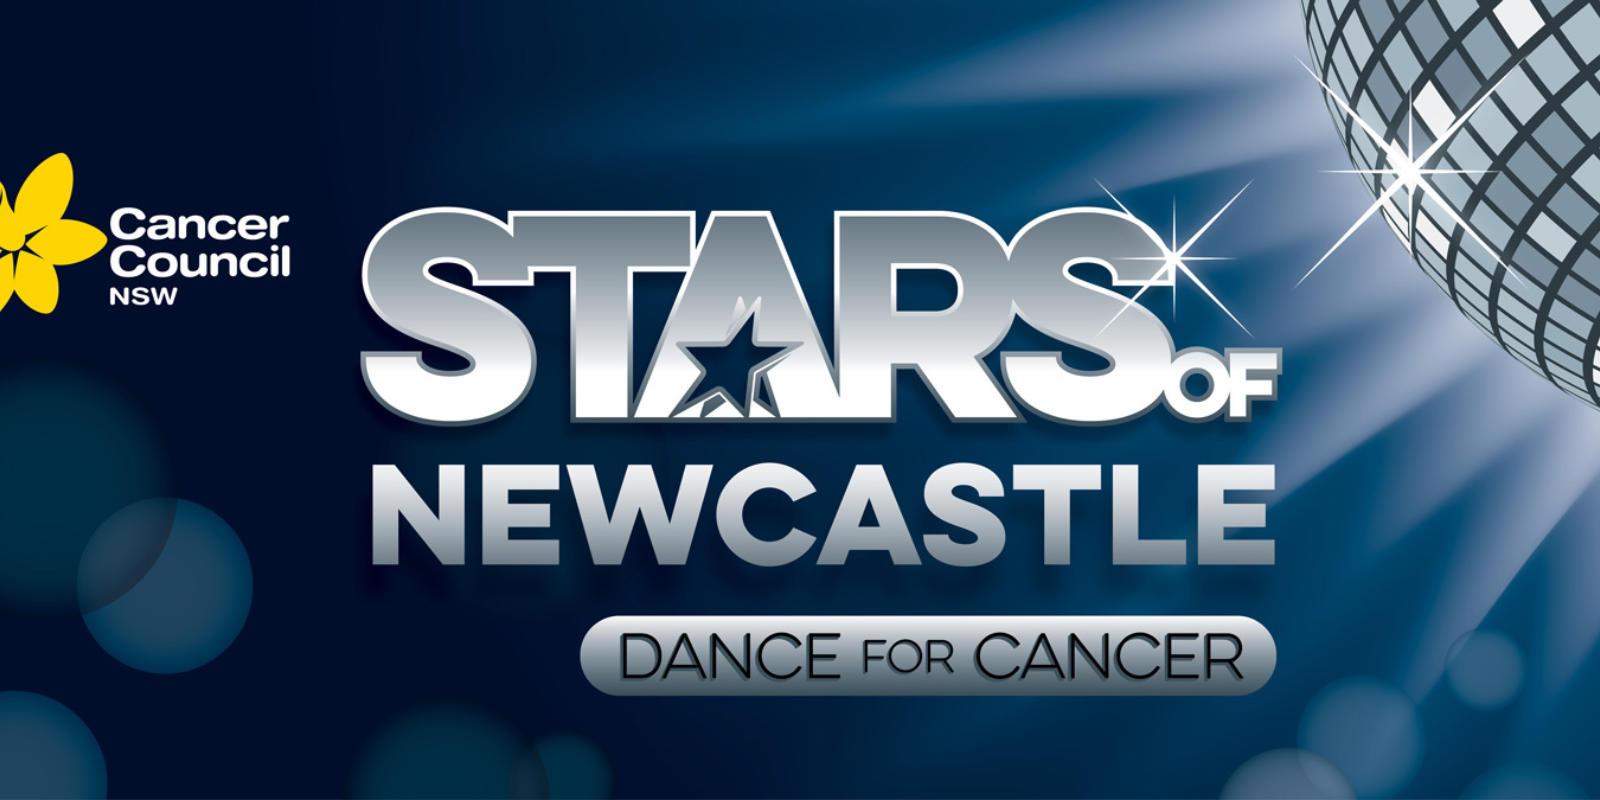 Cc Stars Of Newcastle Logo 1600X675Px